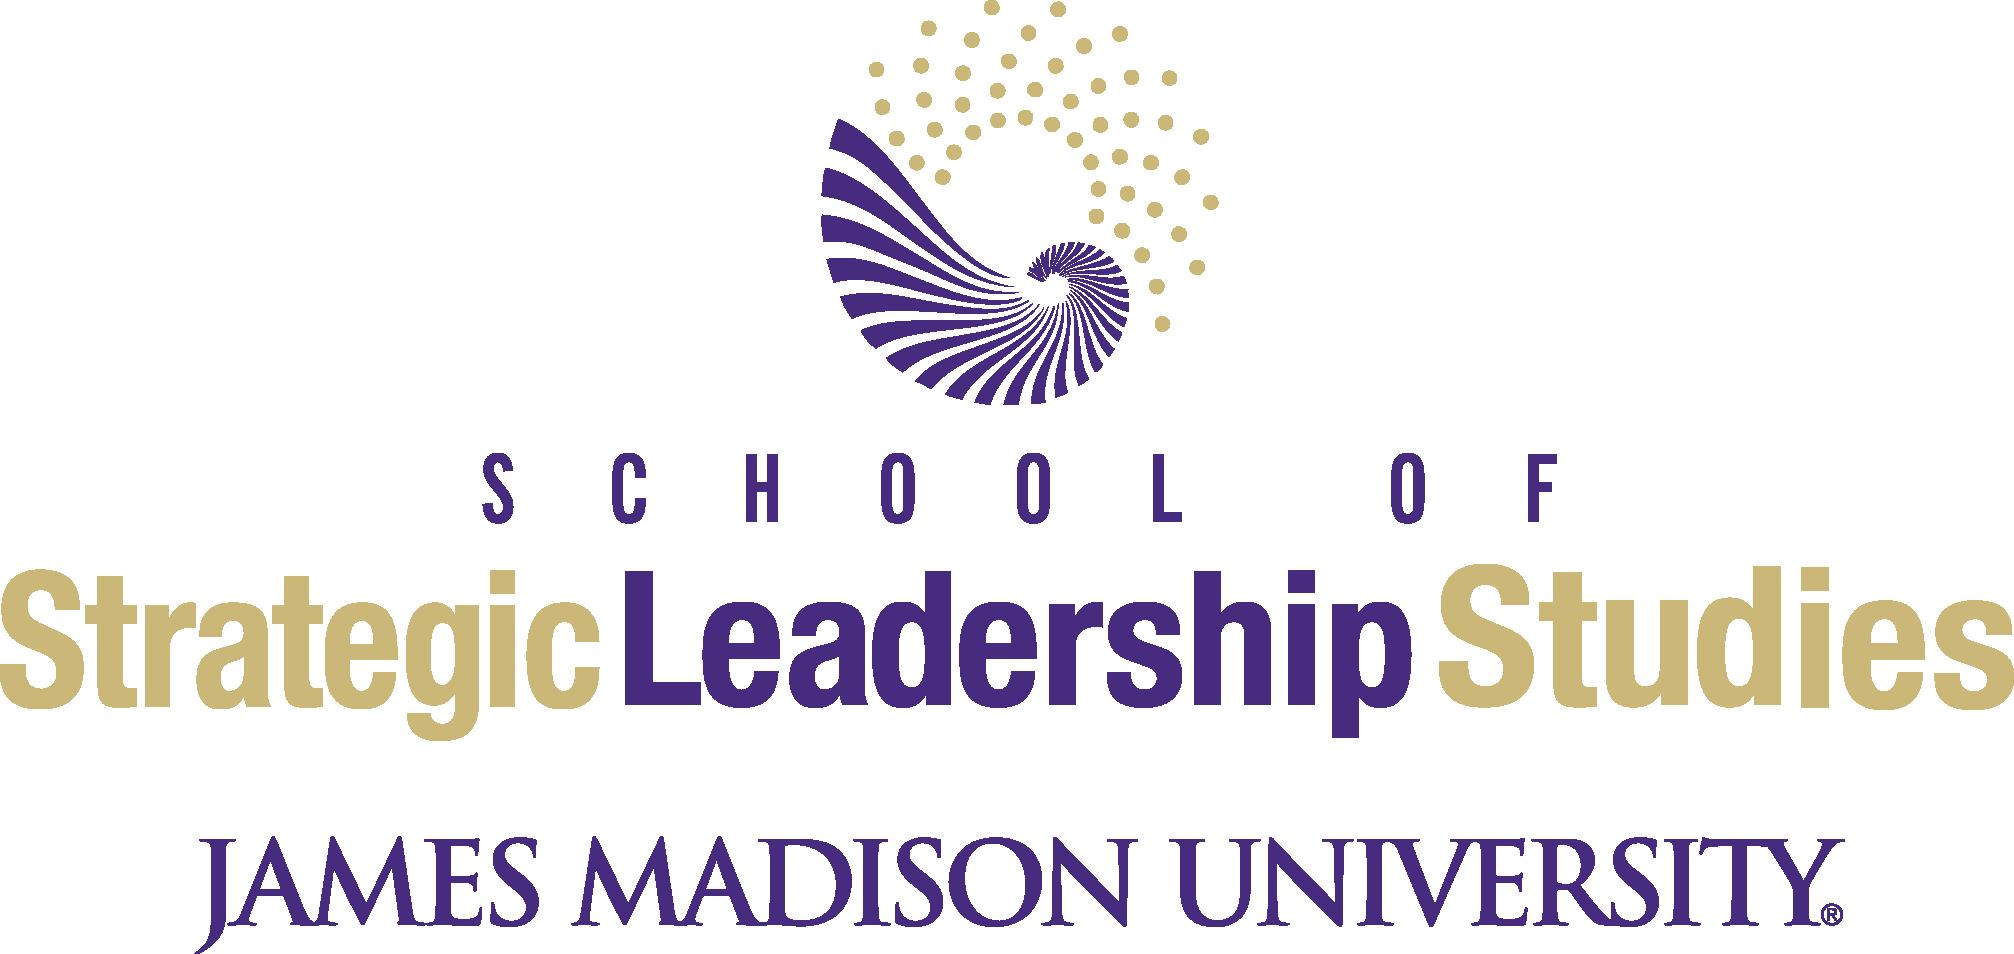 leadership studies The undergraduate certificate in leadership studies is an 18 credit, interdisciplinary, multidimensional, and experiential program open to all florida state undergraduate students.